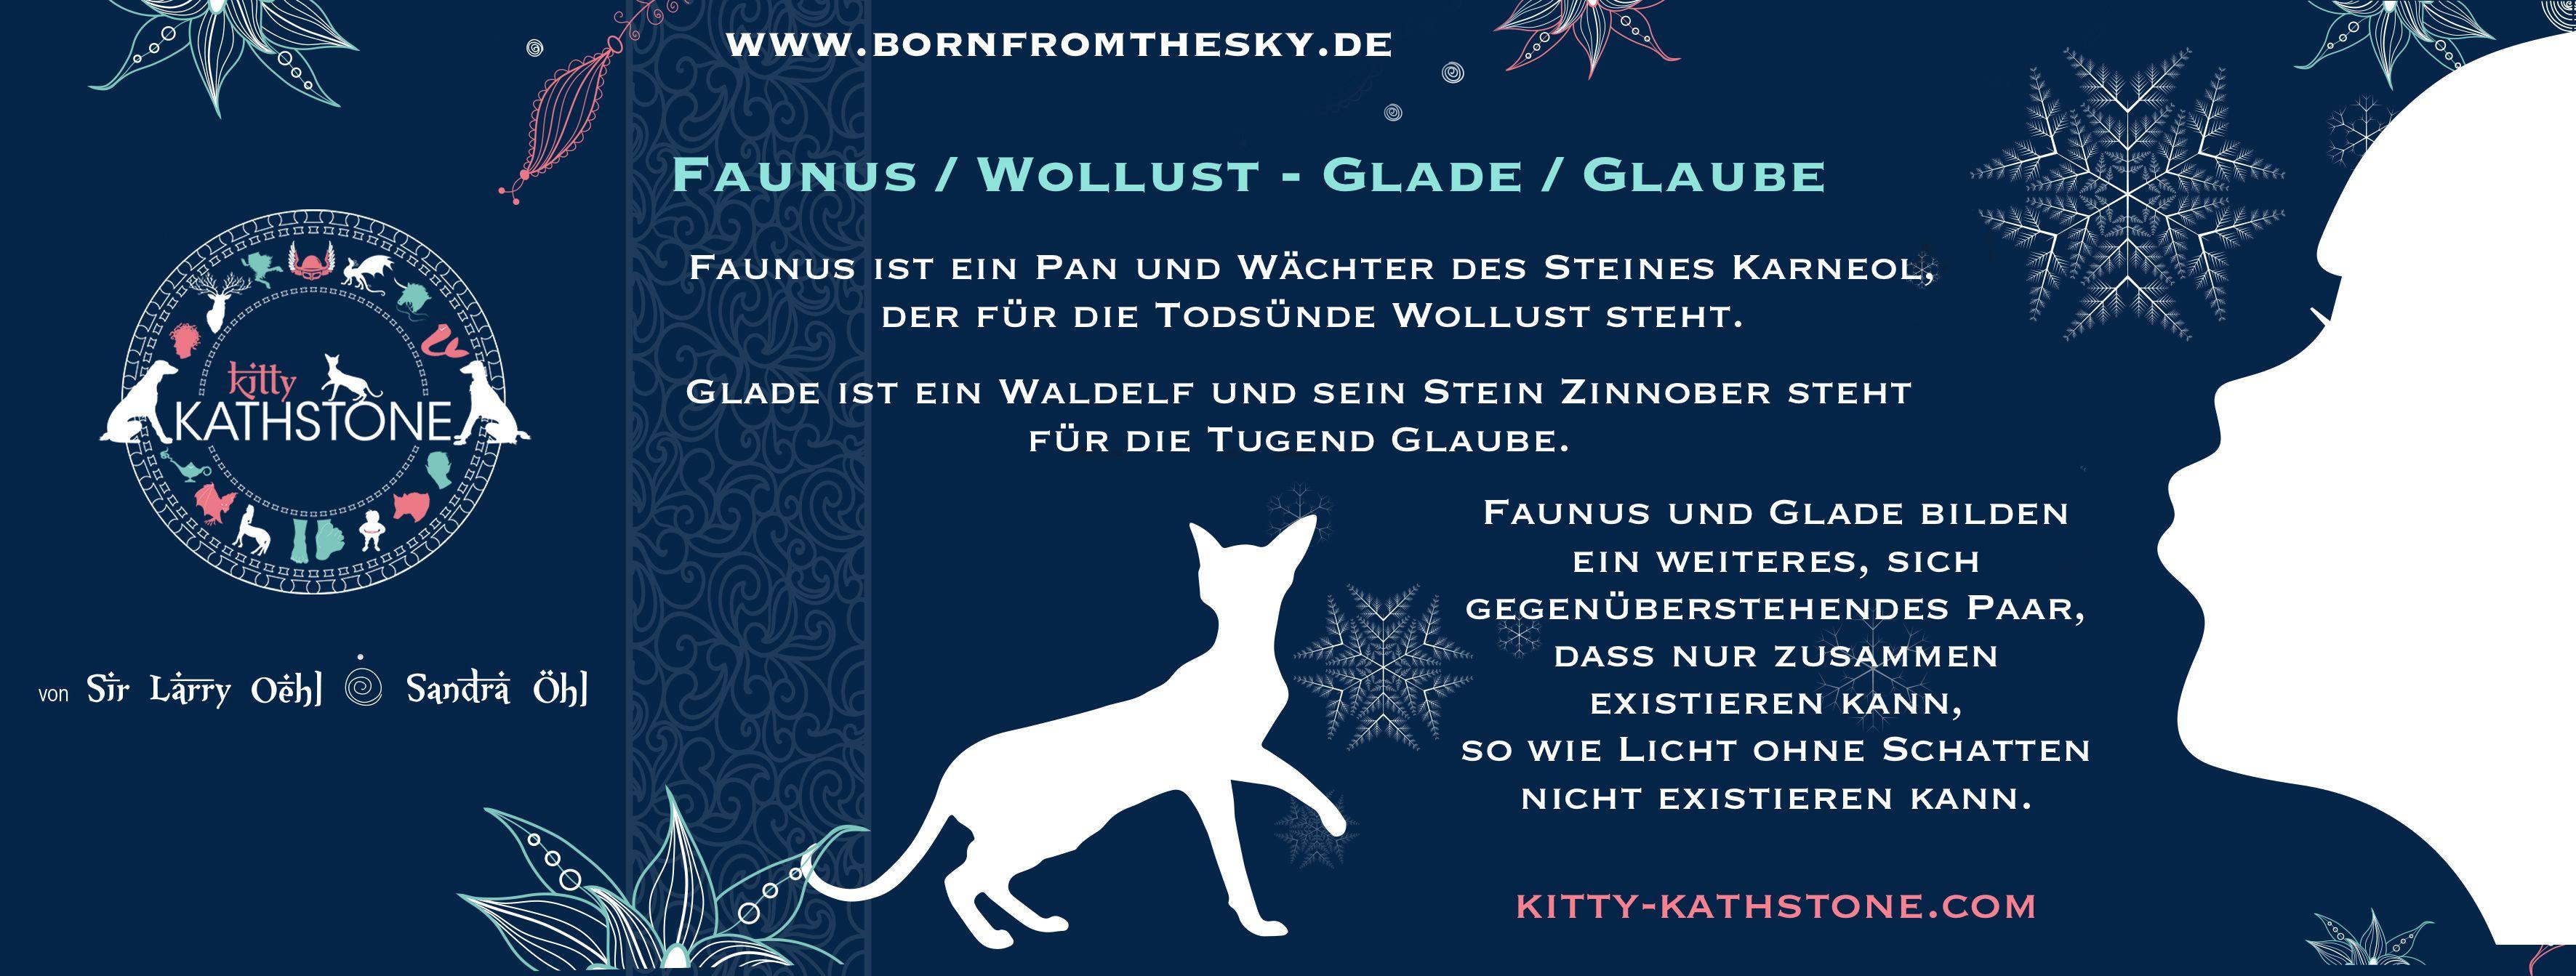 Faunus/ Wollust - Galde/ Glaube